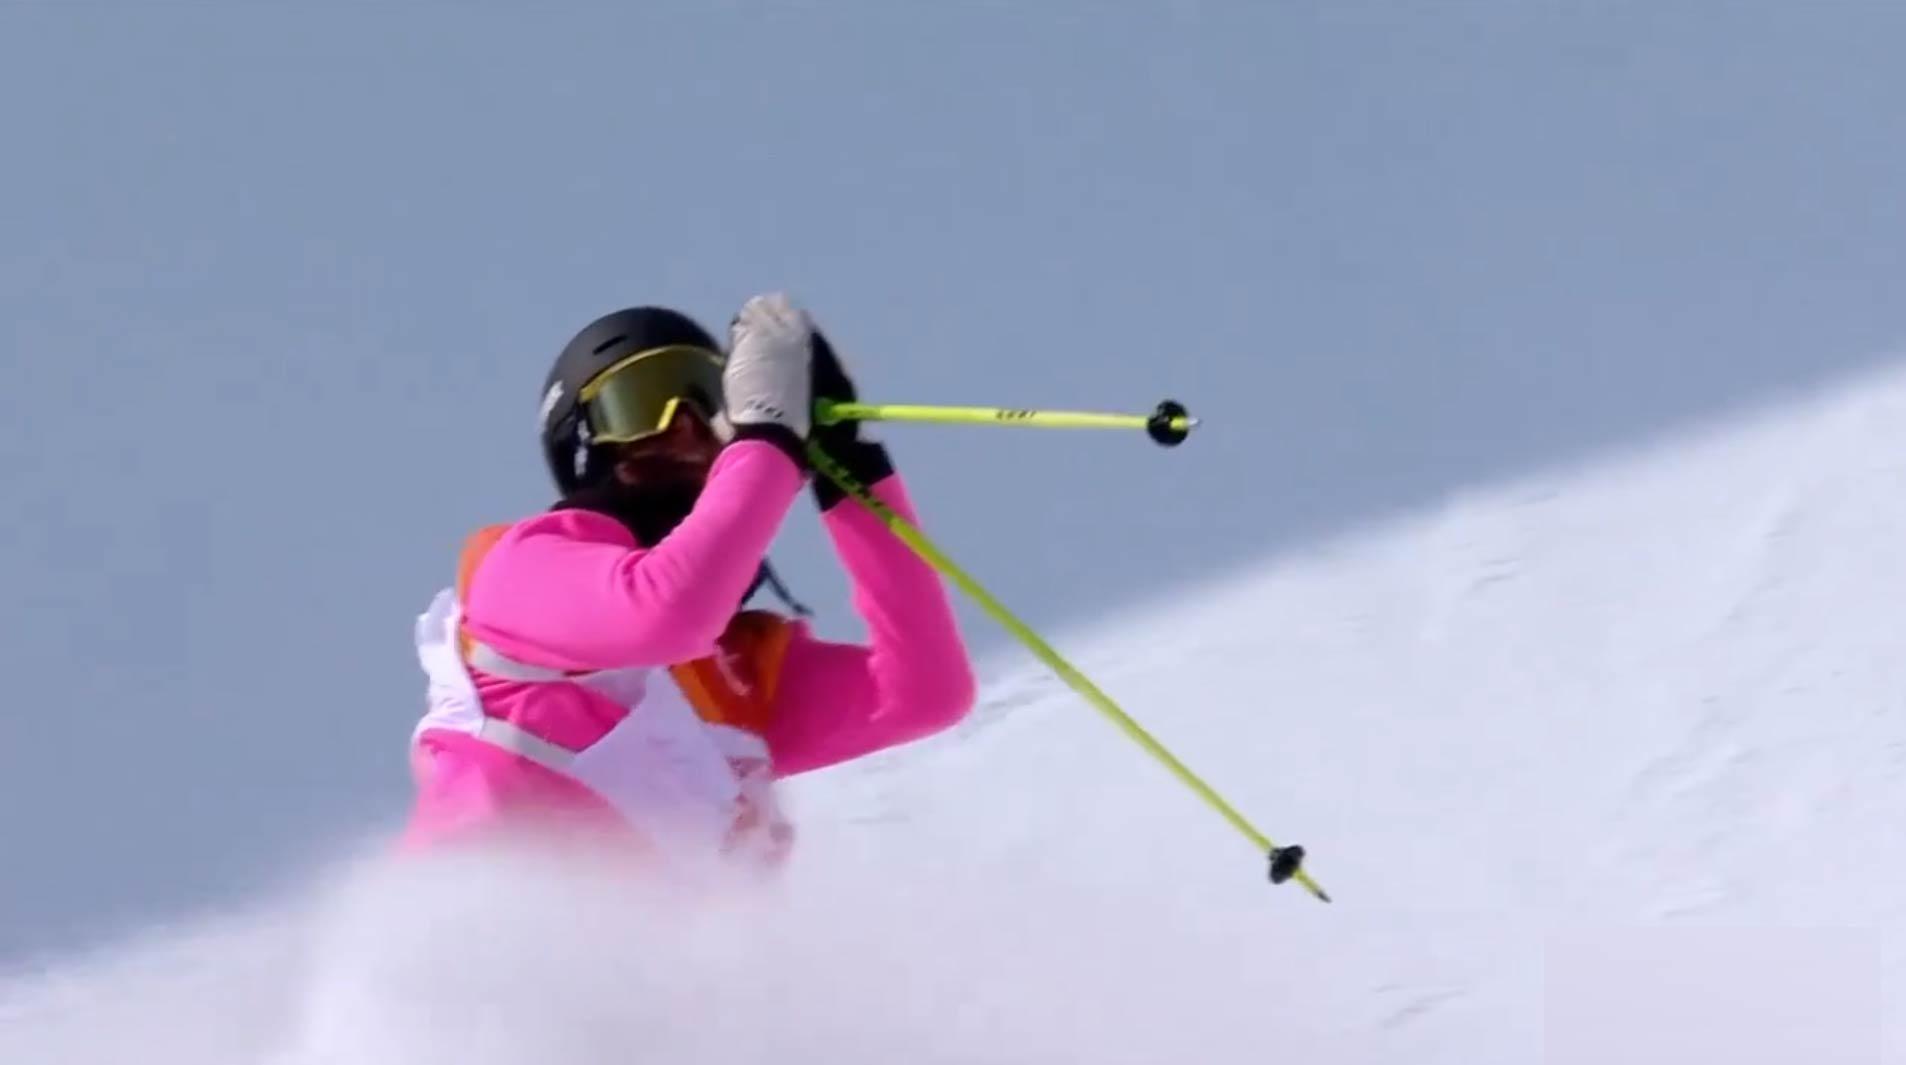 Ski Halfpipe: Cakmakli schafft den Sprung in das Finale - Olympia 2018